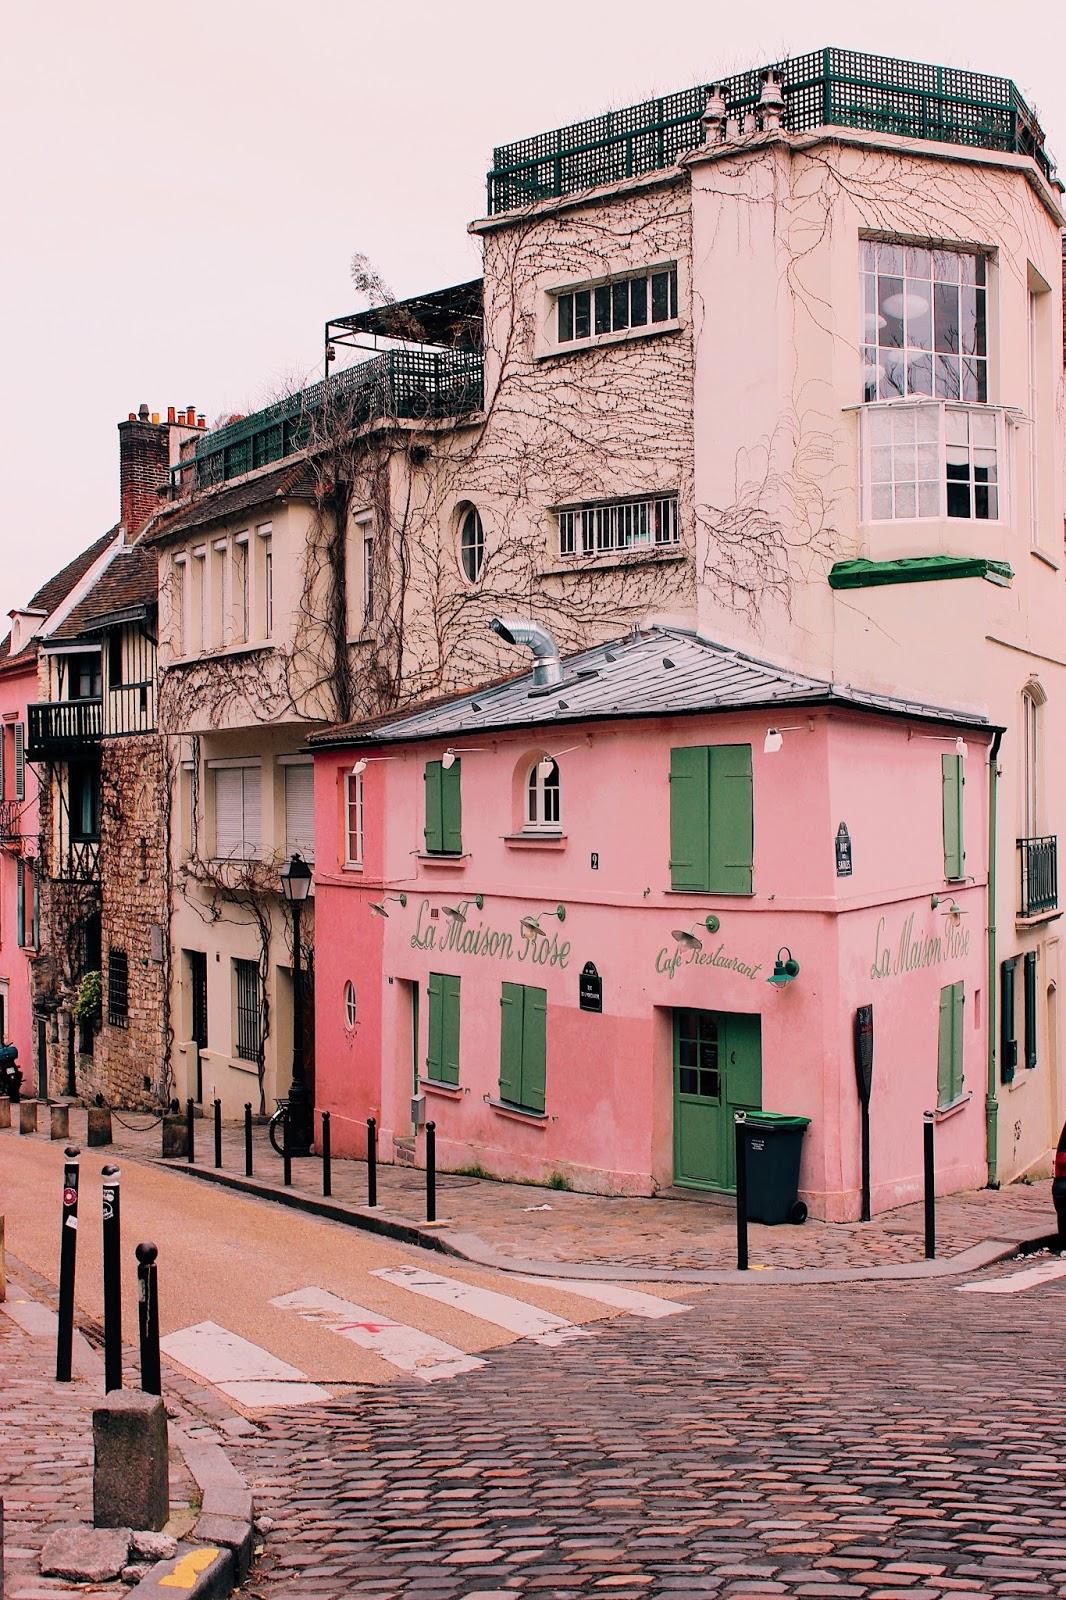 24 hours in paris, a day in paris, how to spend the most perfect 24 hours in paris, paris, travel guide,  la maison rose, montamarte